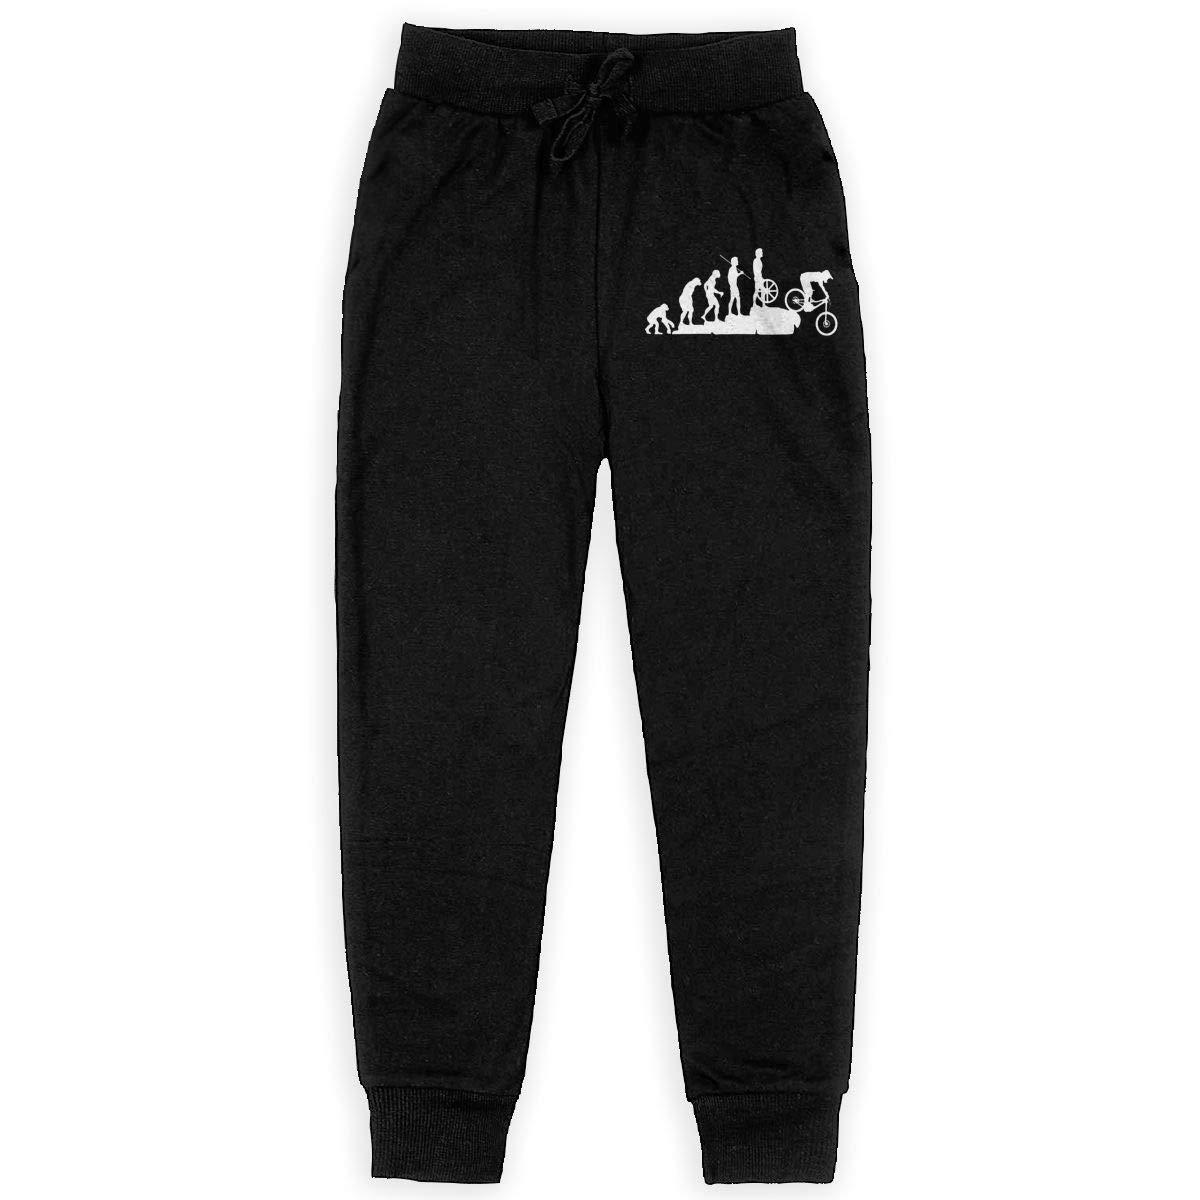 Ji88pX@ Workout Leggings for Youth Slim Mountain Bike Downhill Cotton Long Sweatpants for Youth